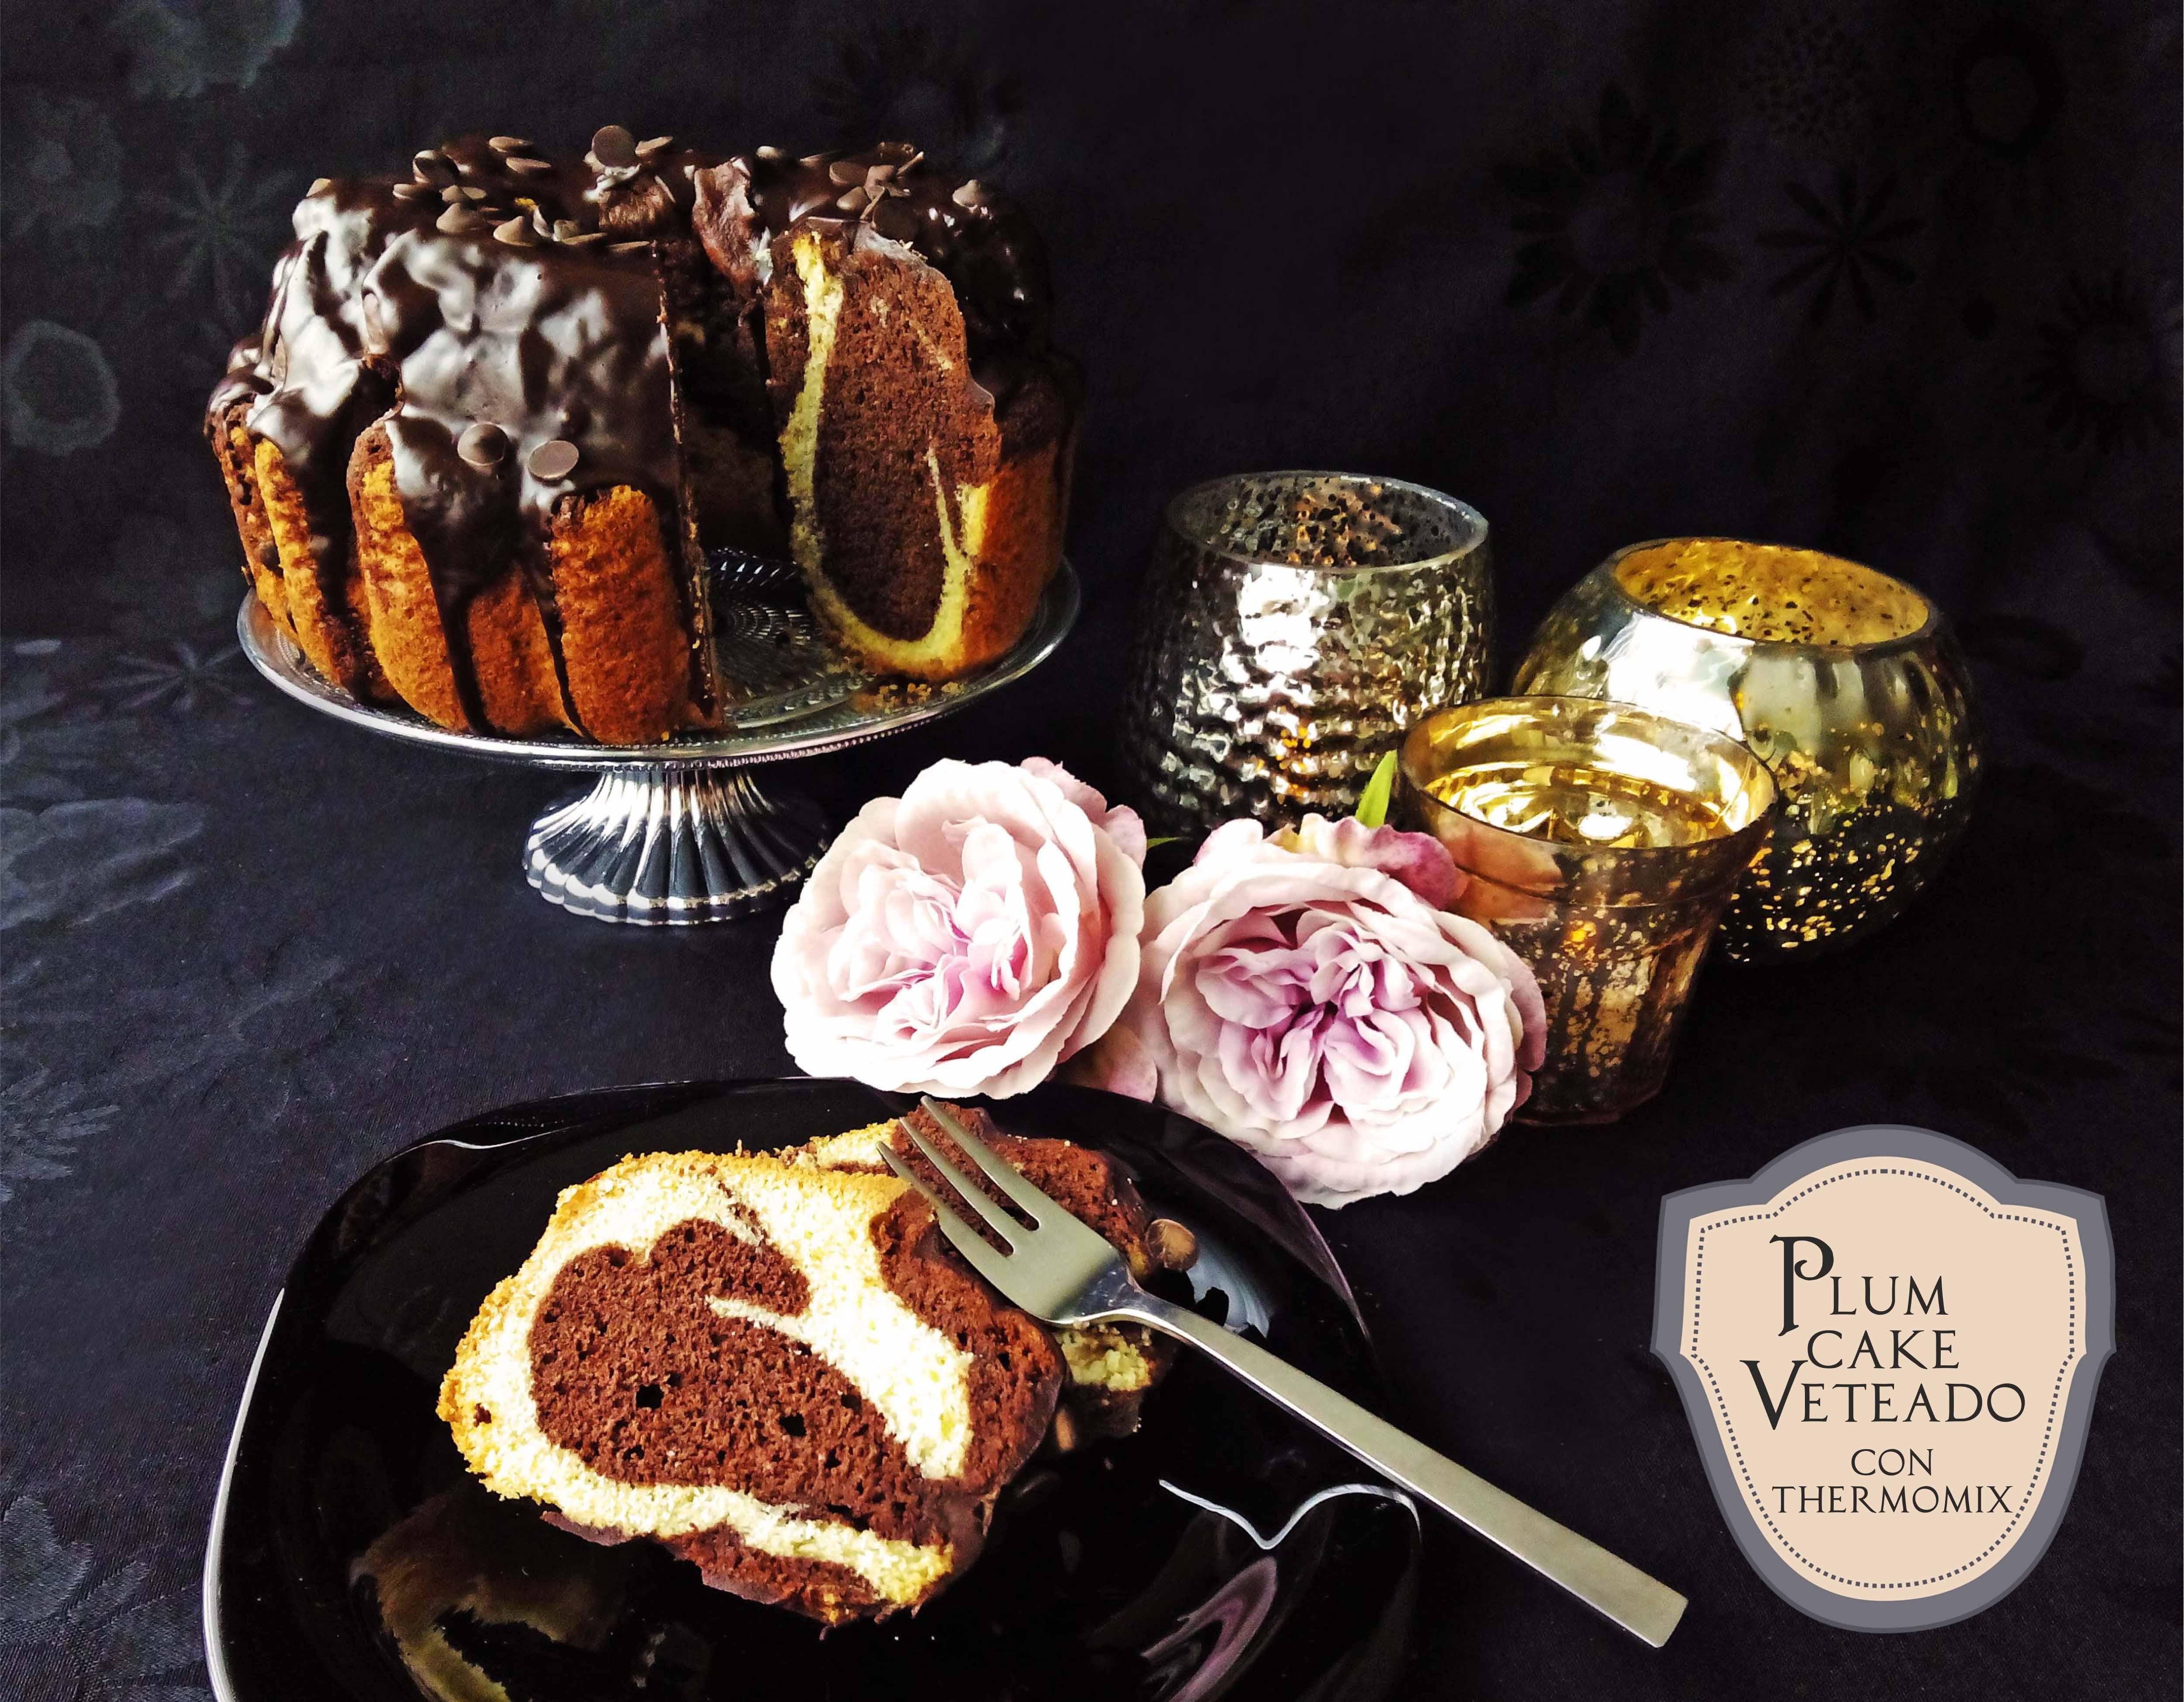 PLUM CAKE VETEADO. También versión SIN GLUTEN.